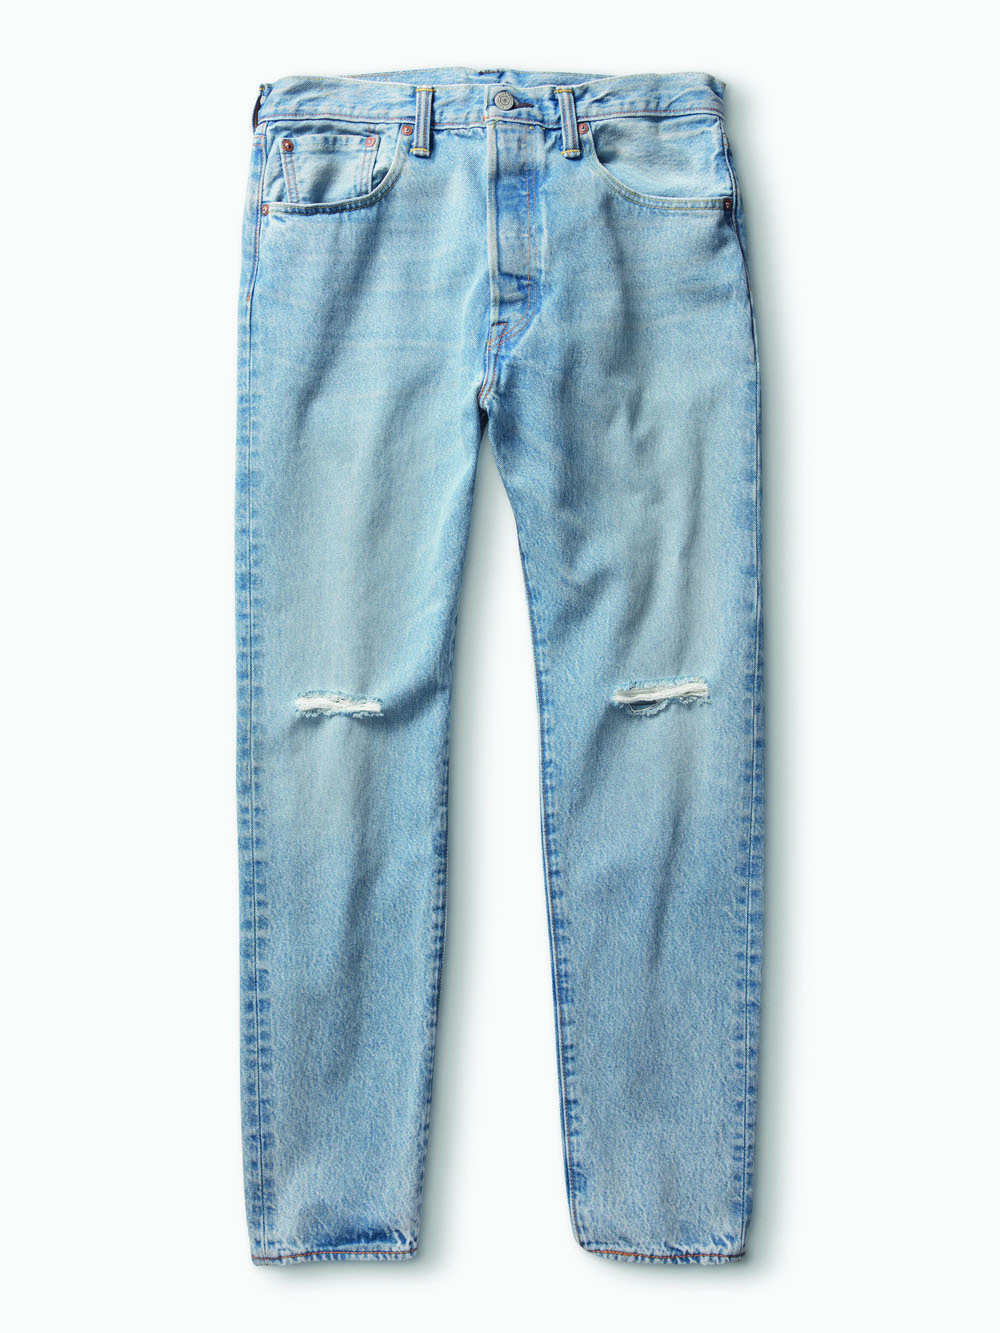 Loose Jeans Mens